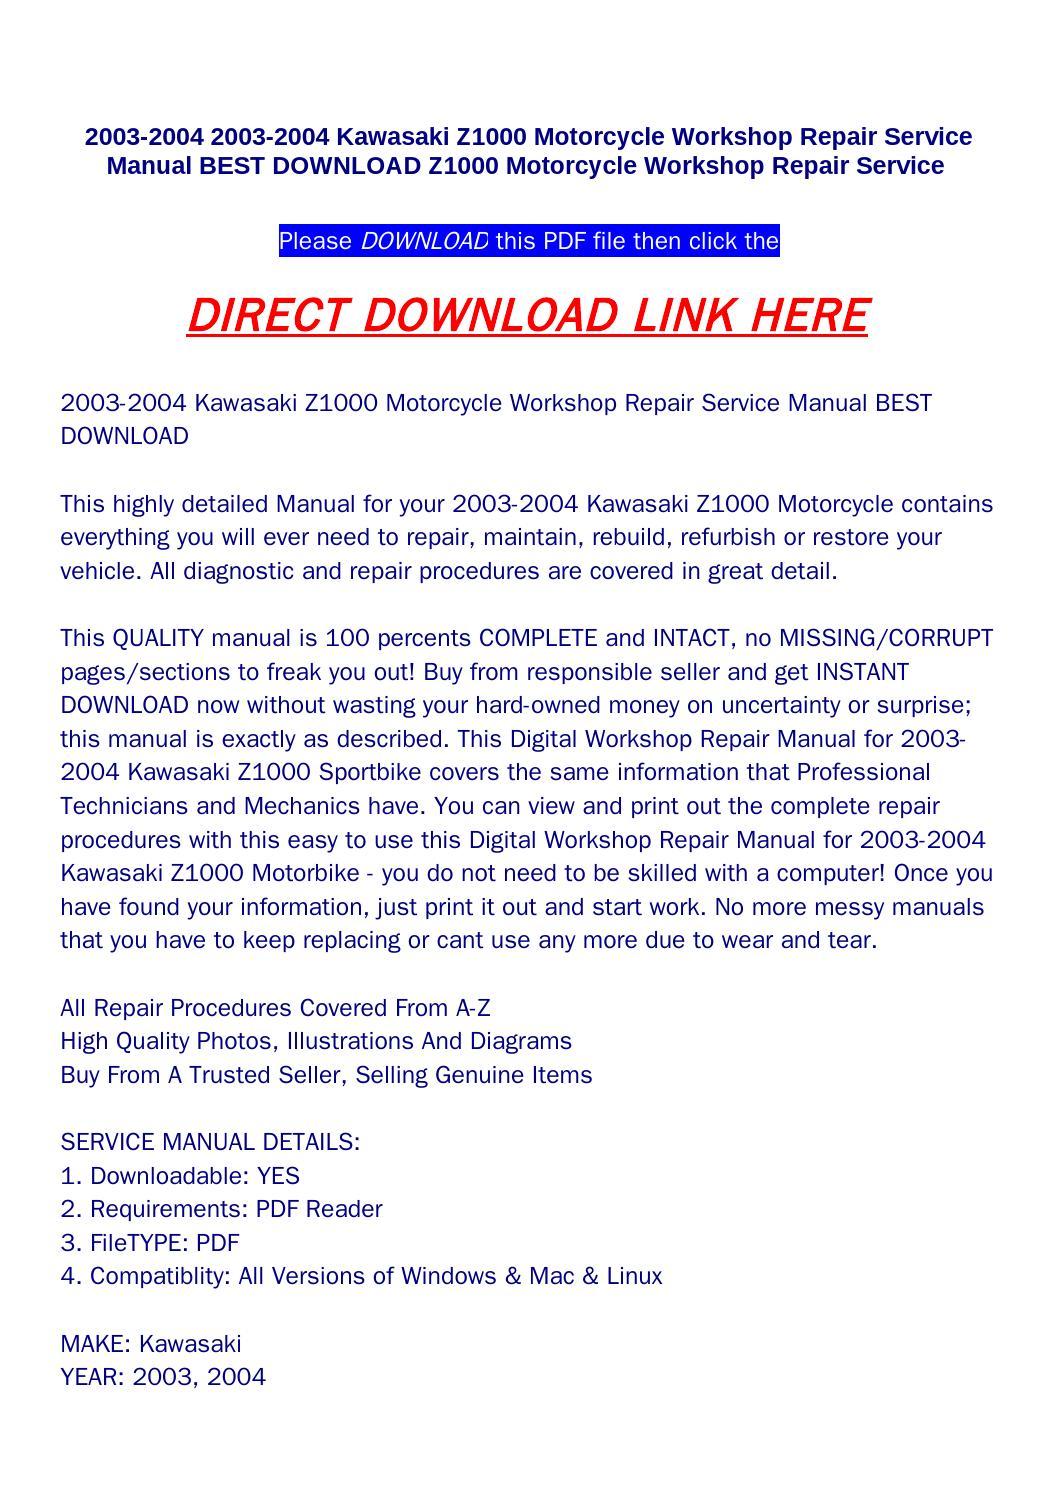 2003 2004 Kawasaki Z1000 Motorcycle Workshop Repair Lighting System Circuit Service Manual Best Download Mot By Bonus300 Issuu